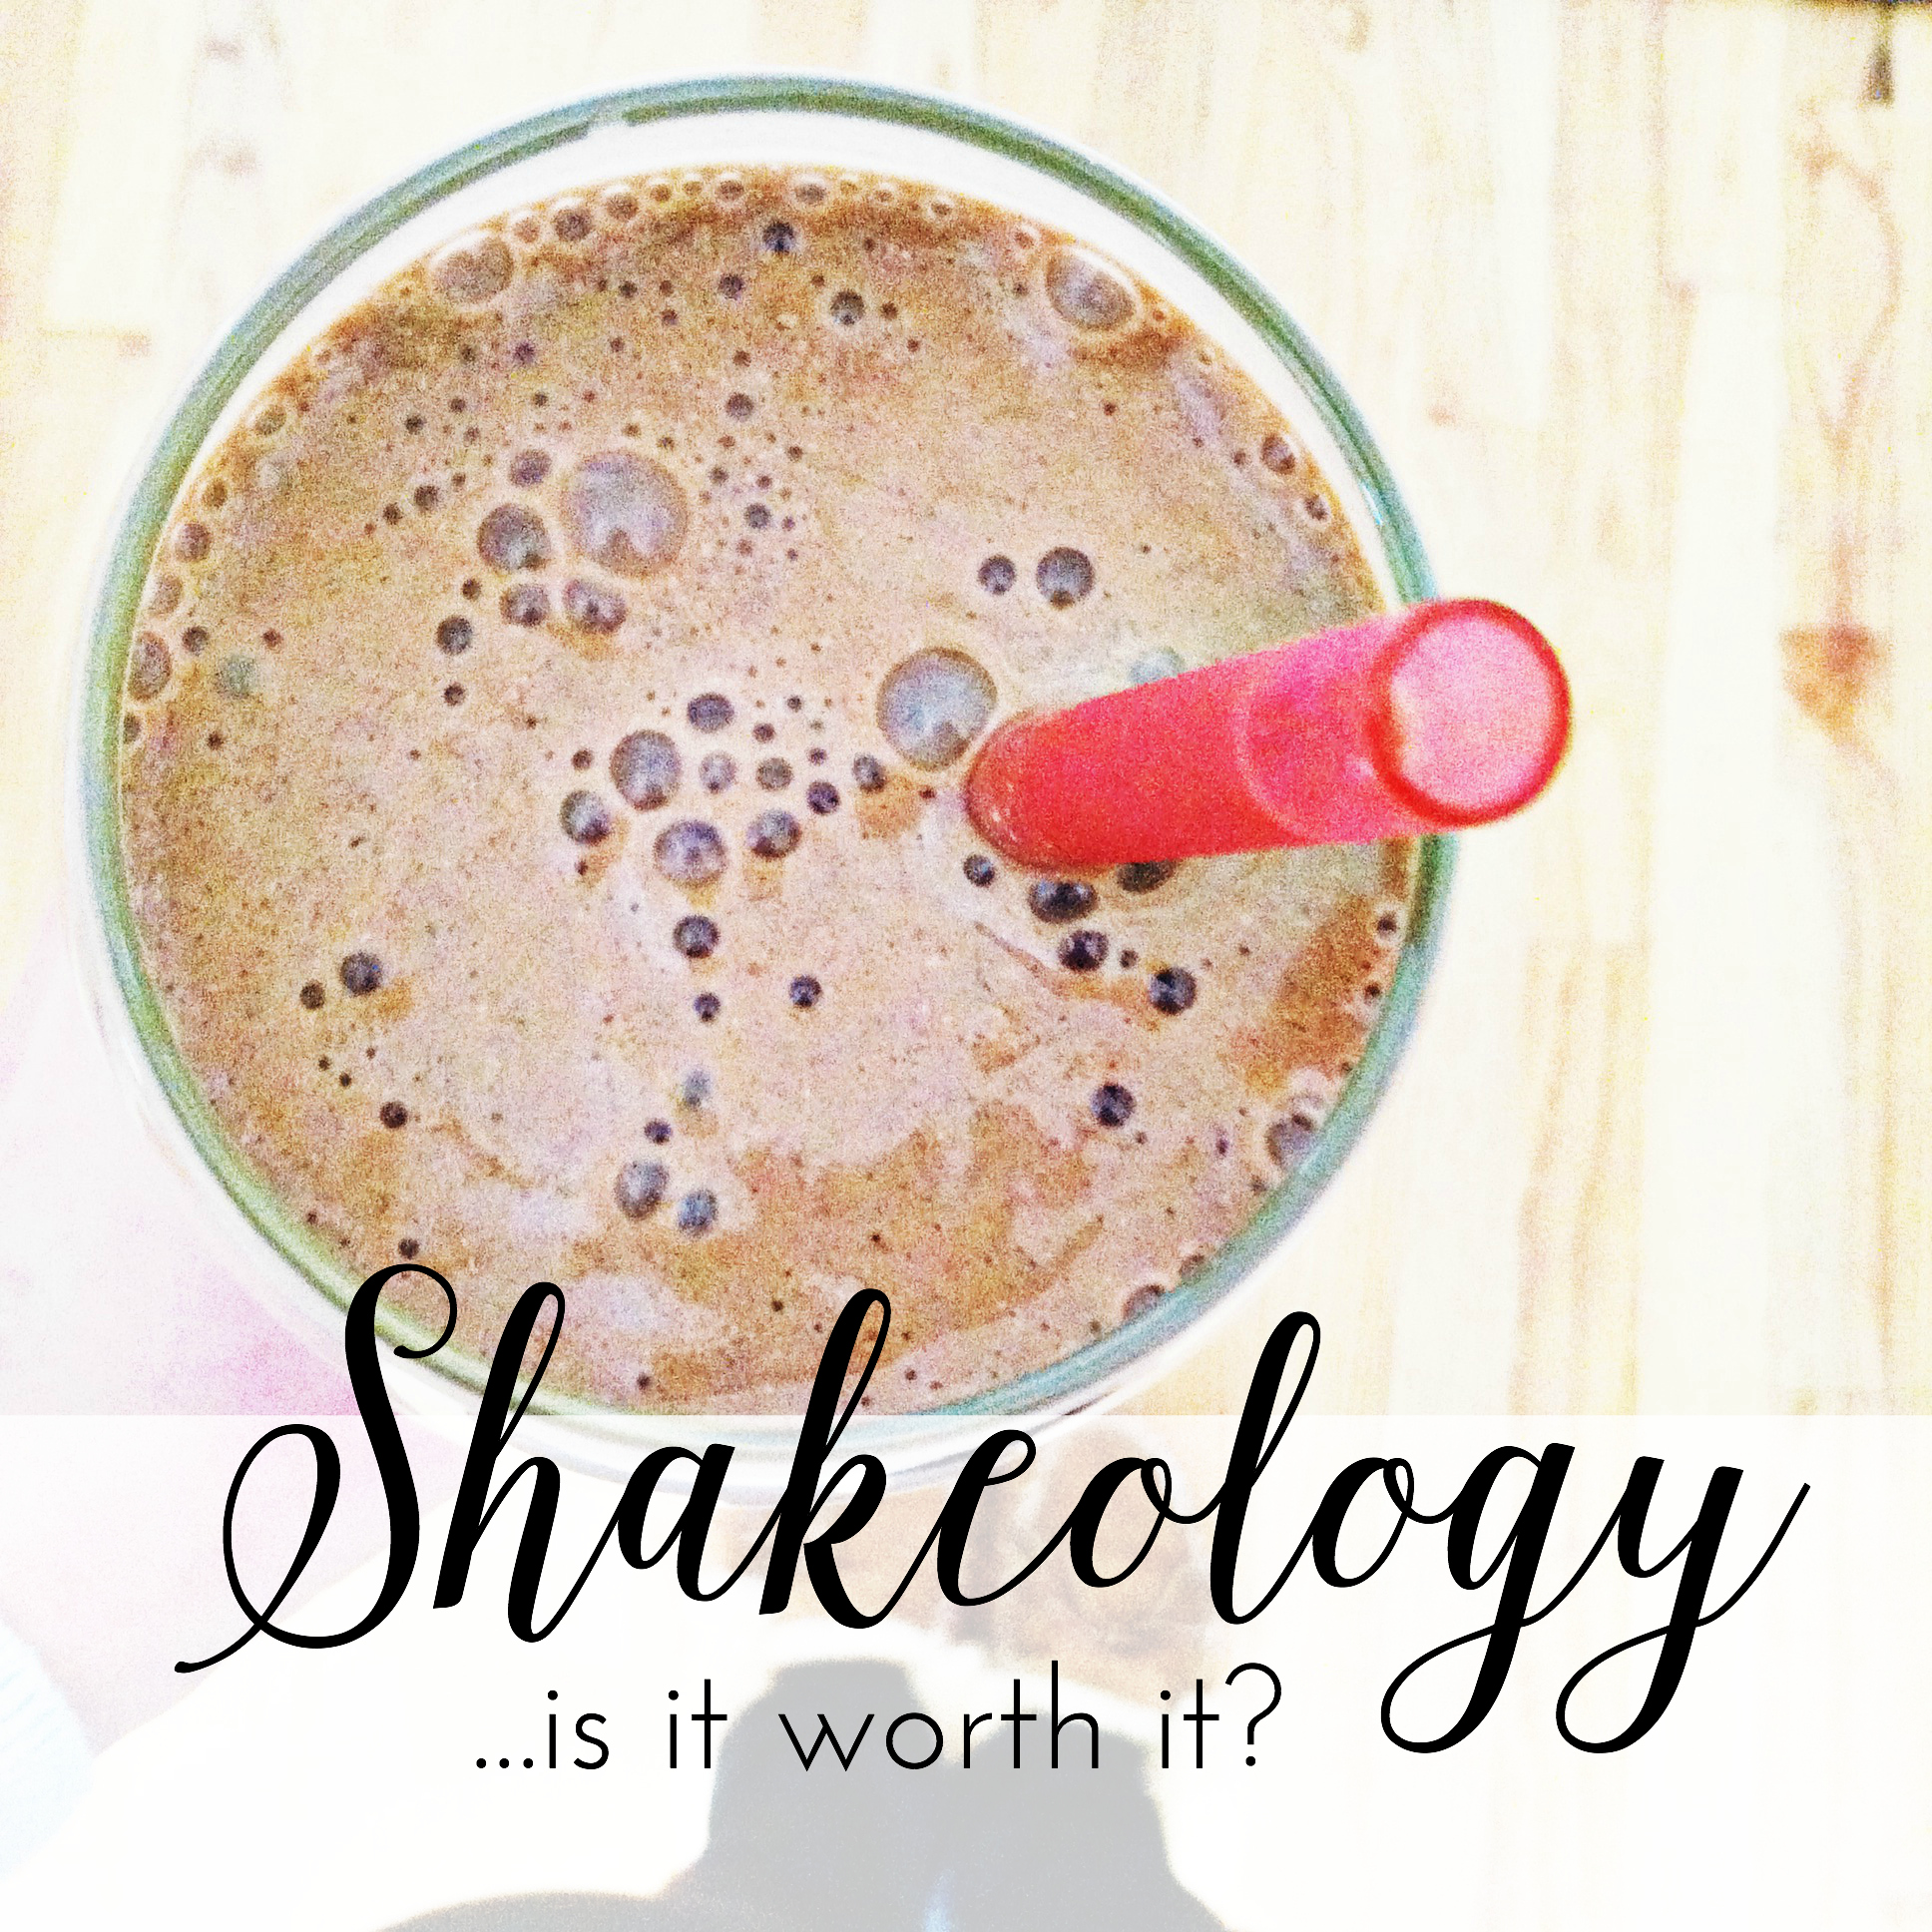 is shakeology worth it?